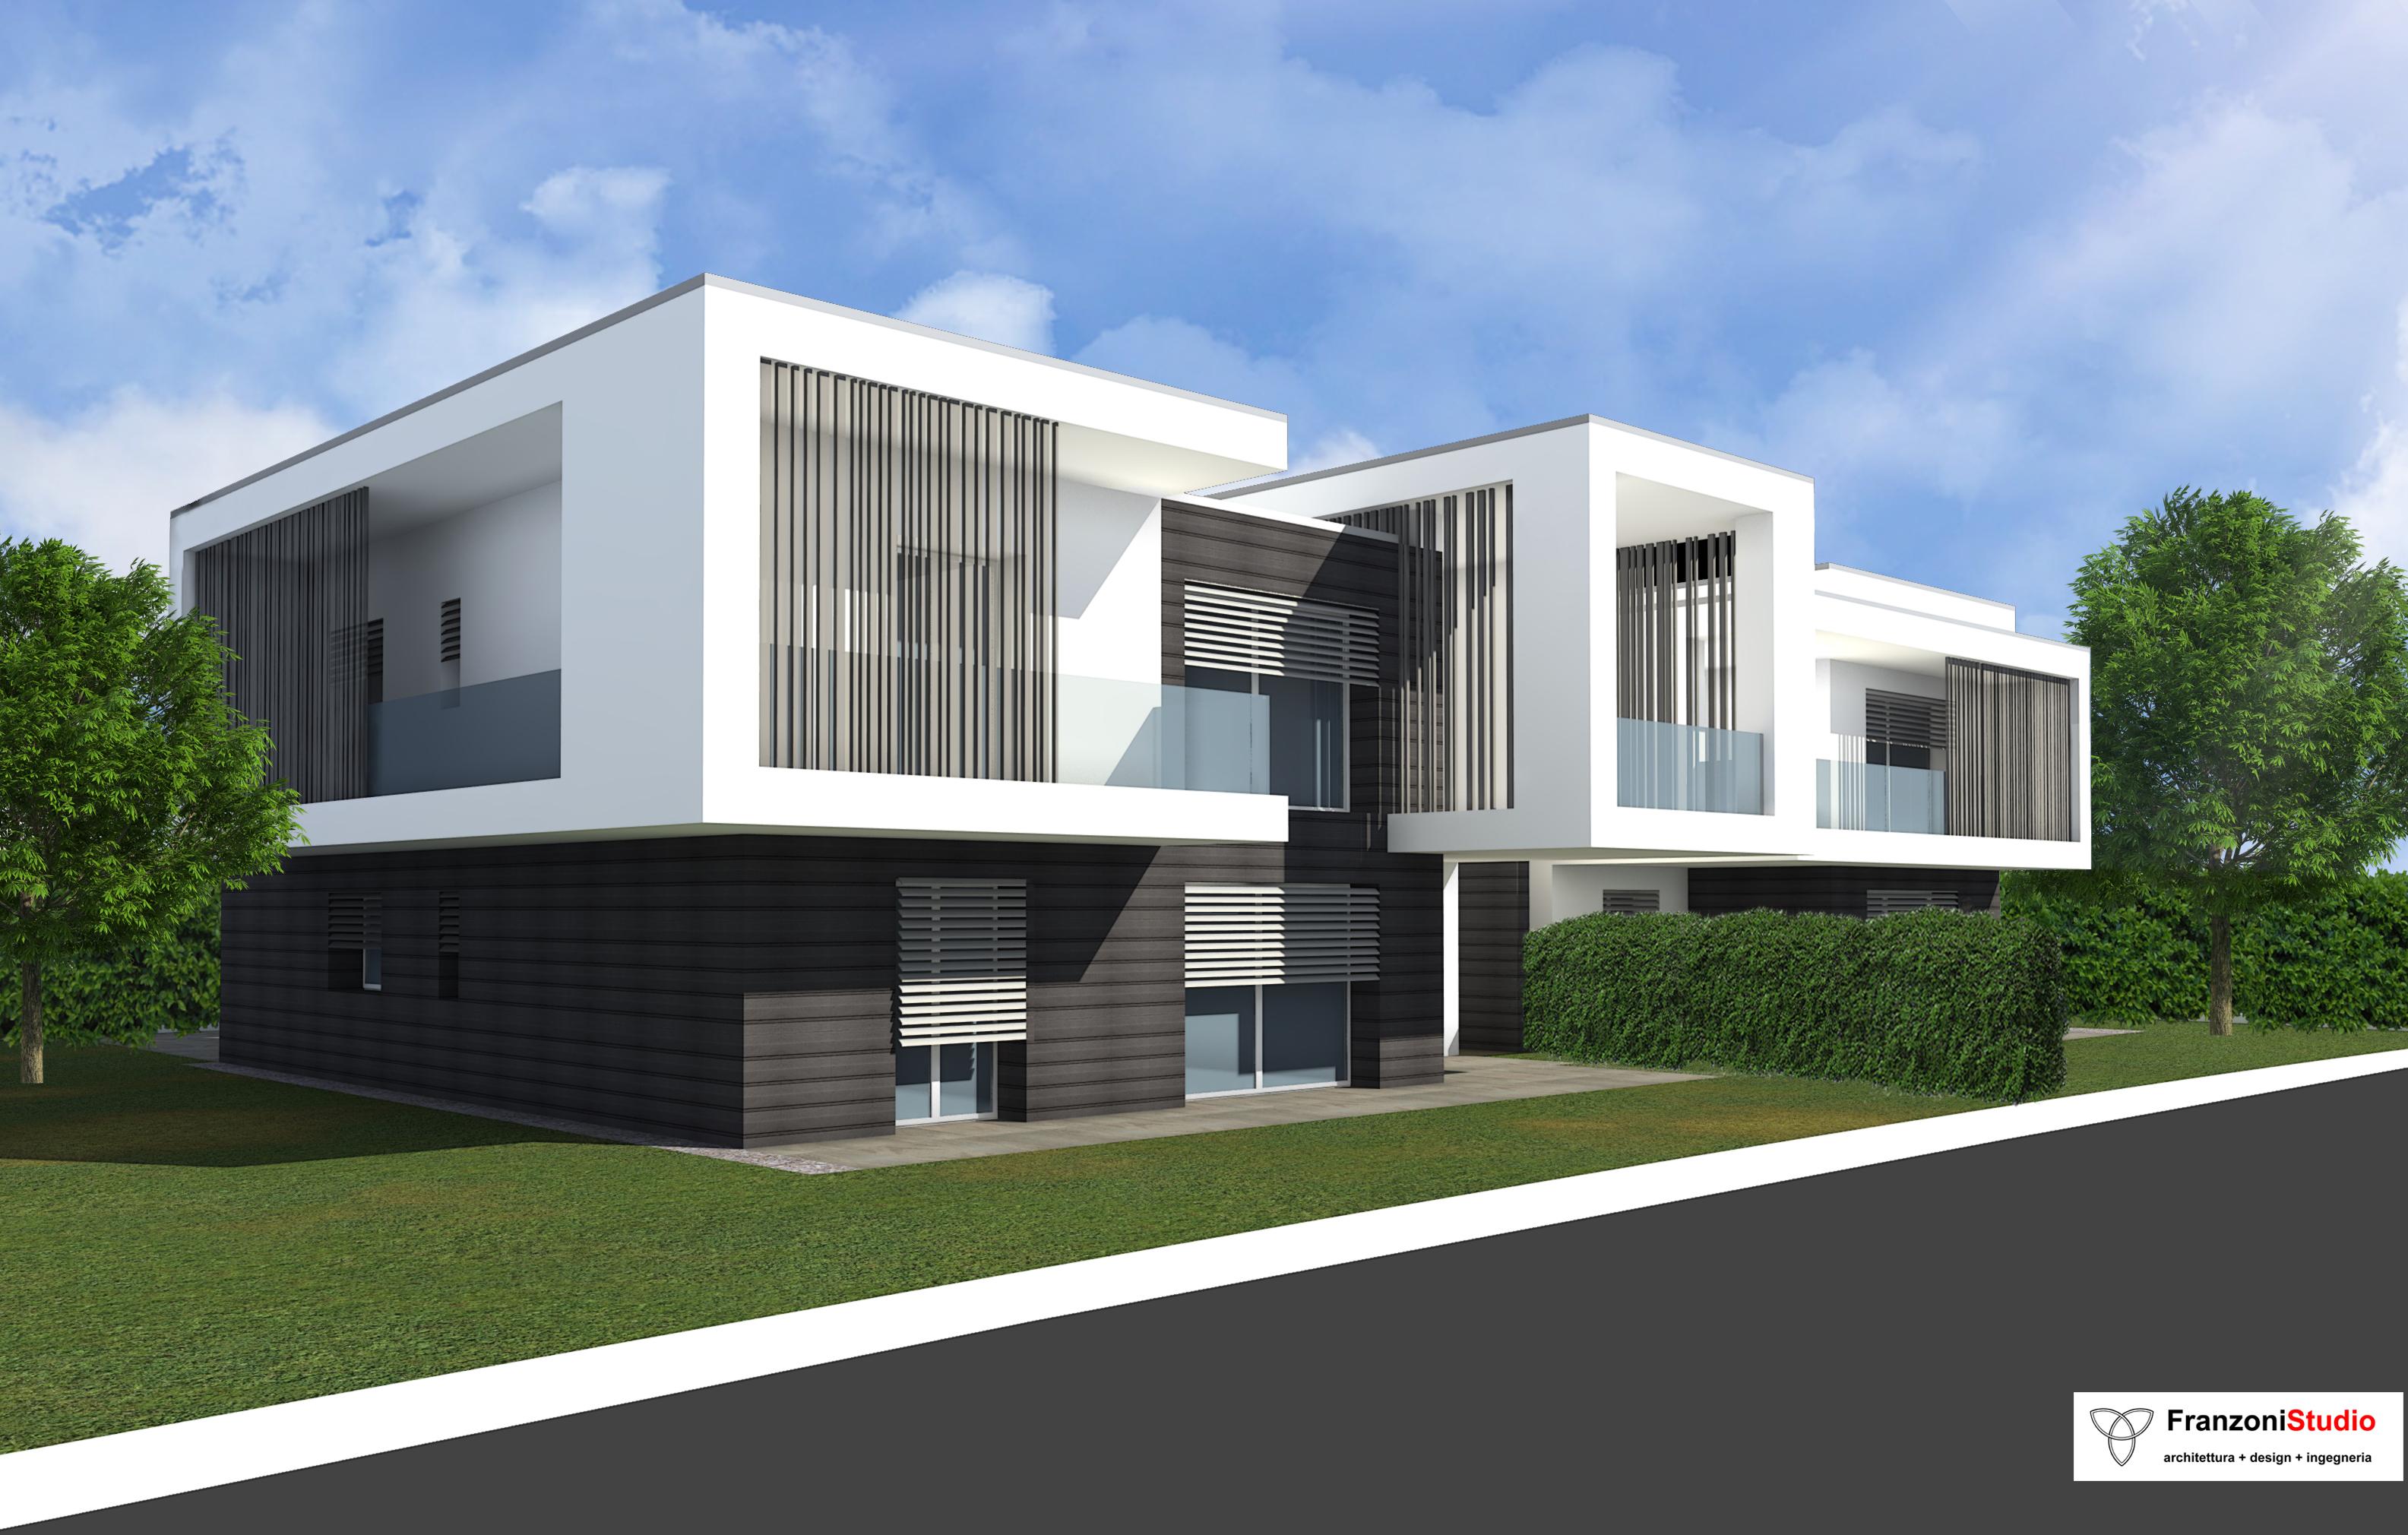 Ville 1053 franzoni studio for Ville moderne design